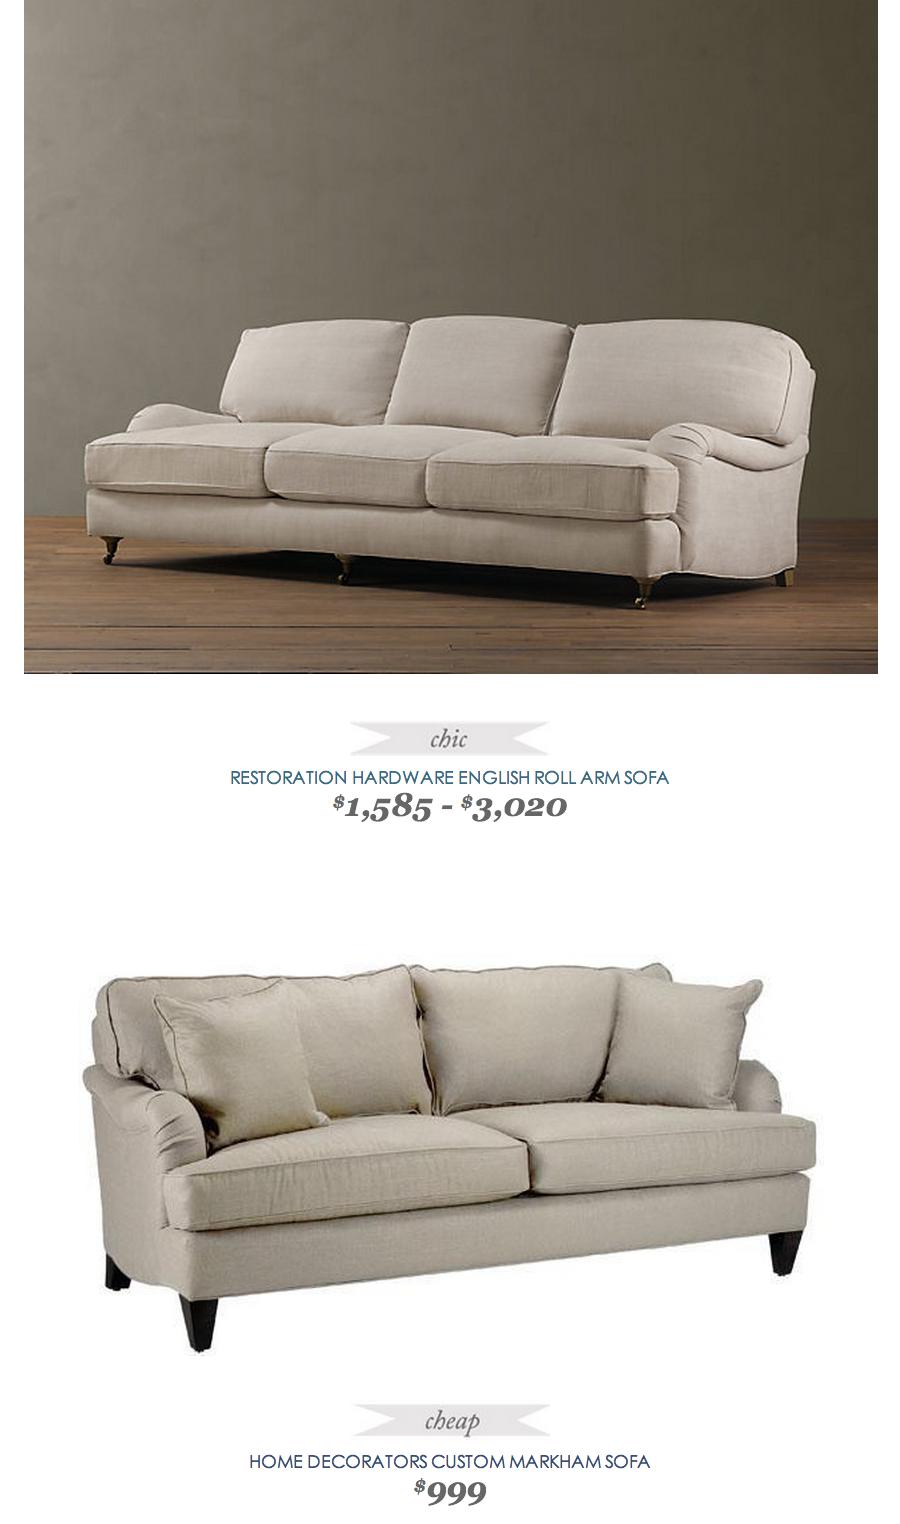 Fine Restoration Hardware English Roll Arm Sofa Copycatchic Download Free Architecture Designs Crovemadebymaigaardcom